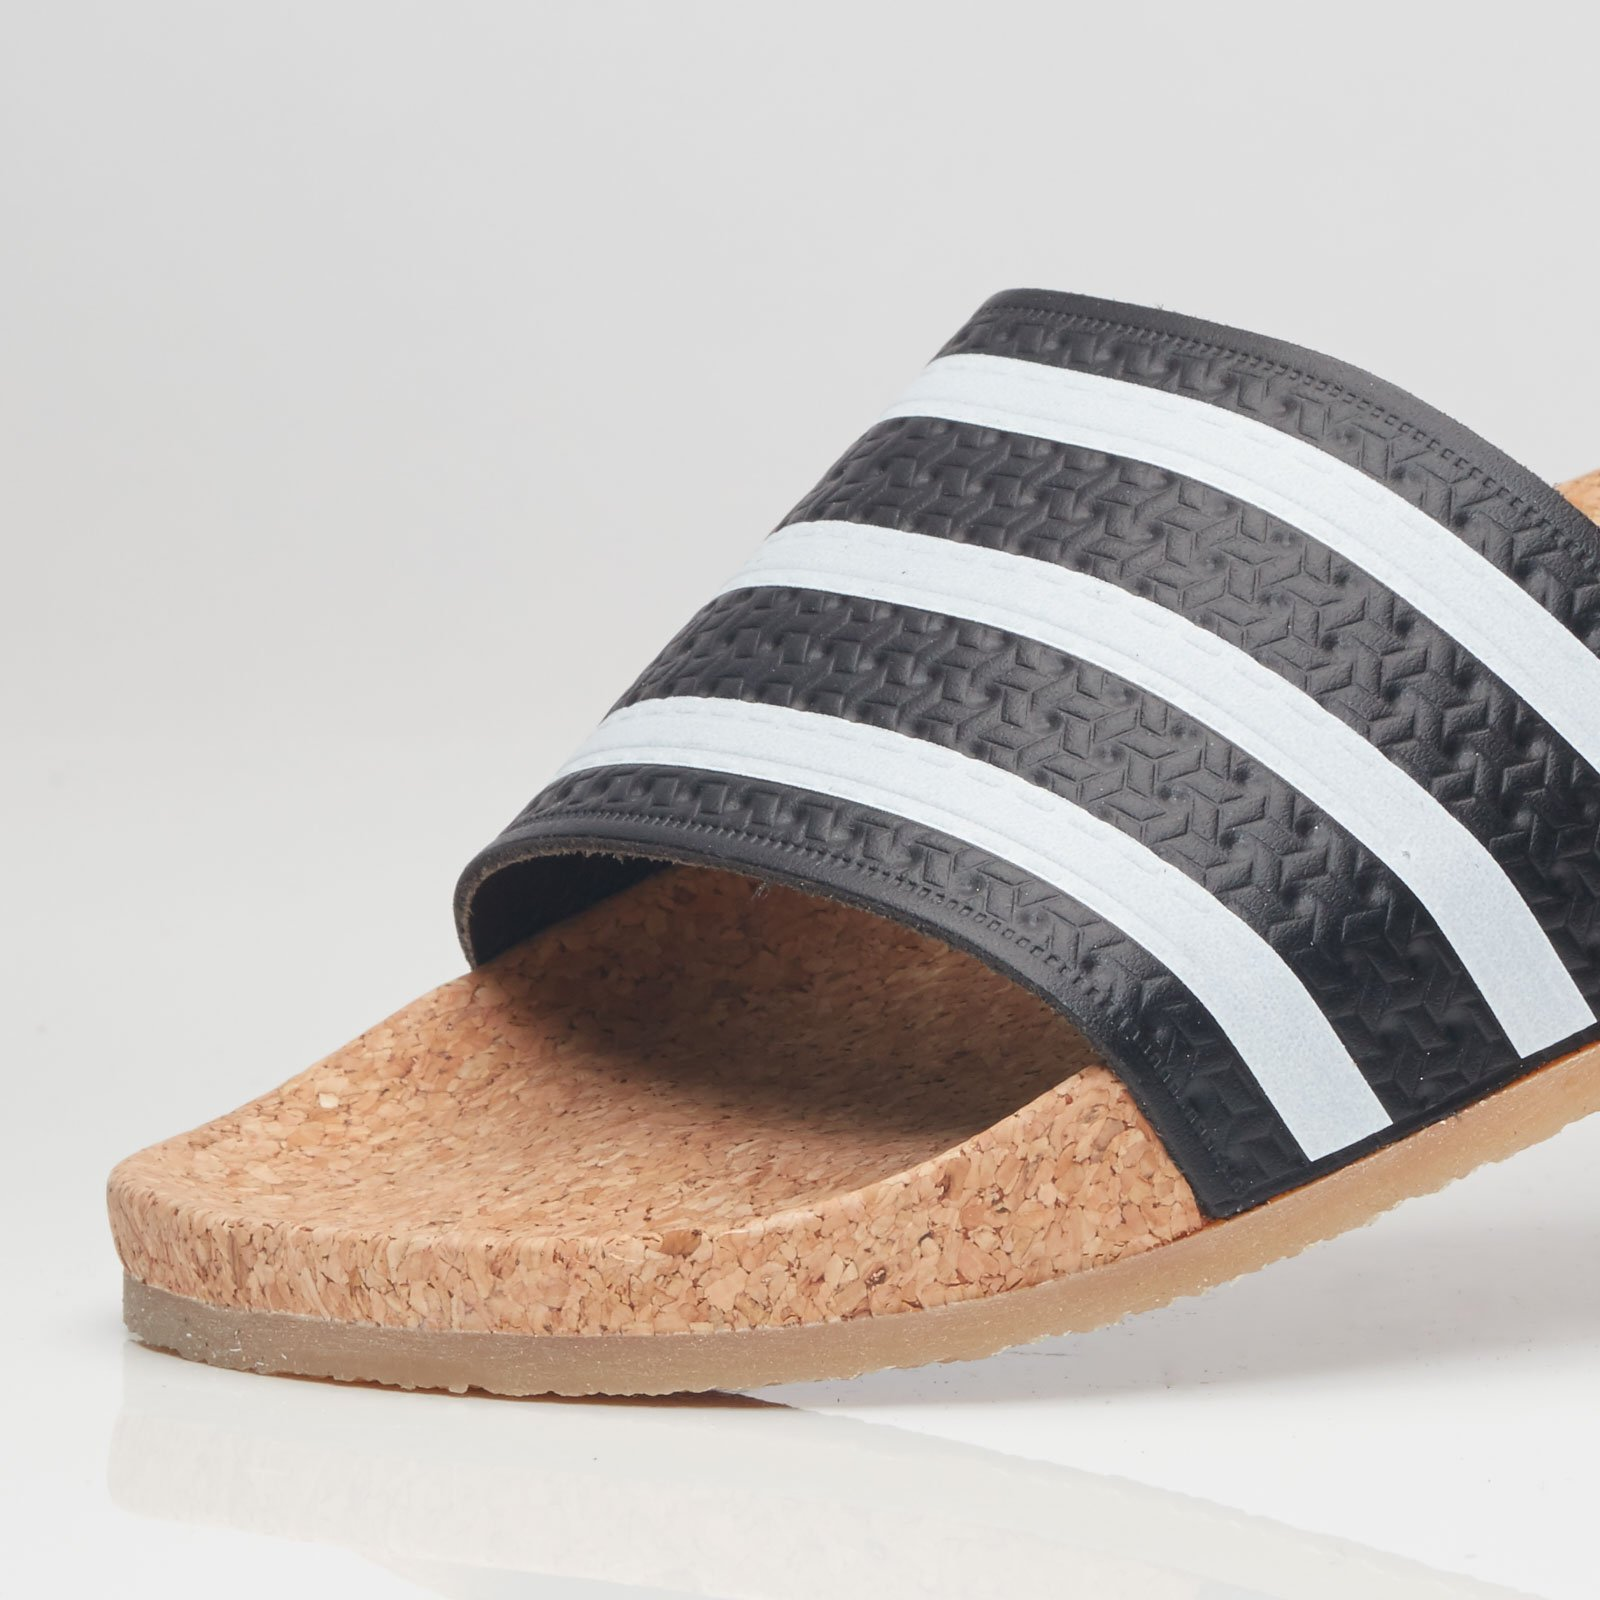 adidas adilette cork schwarz